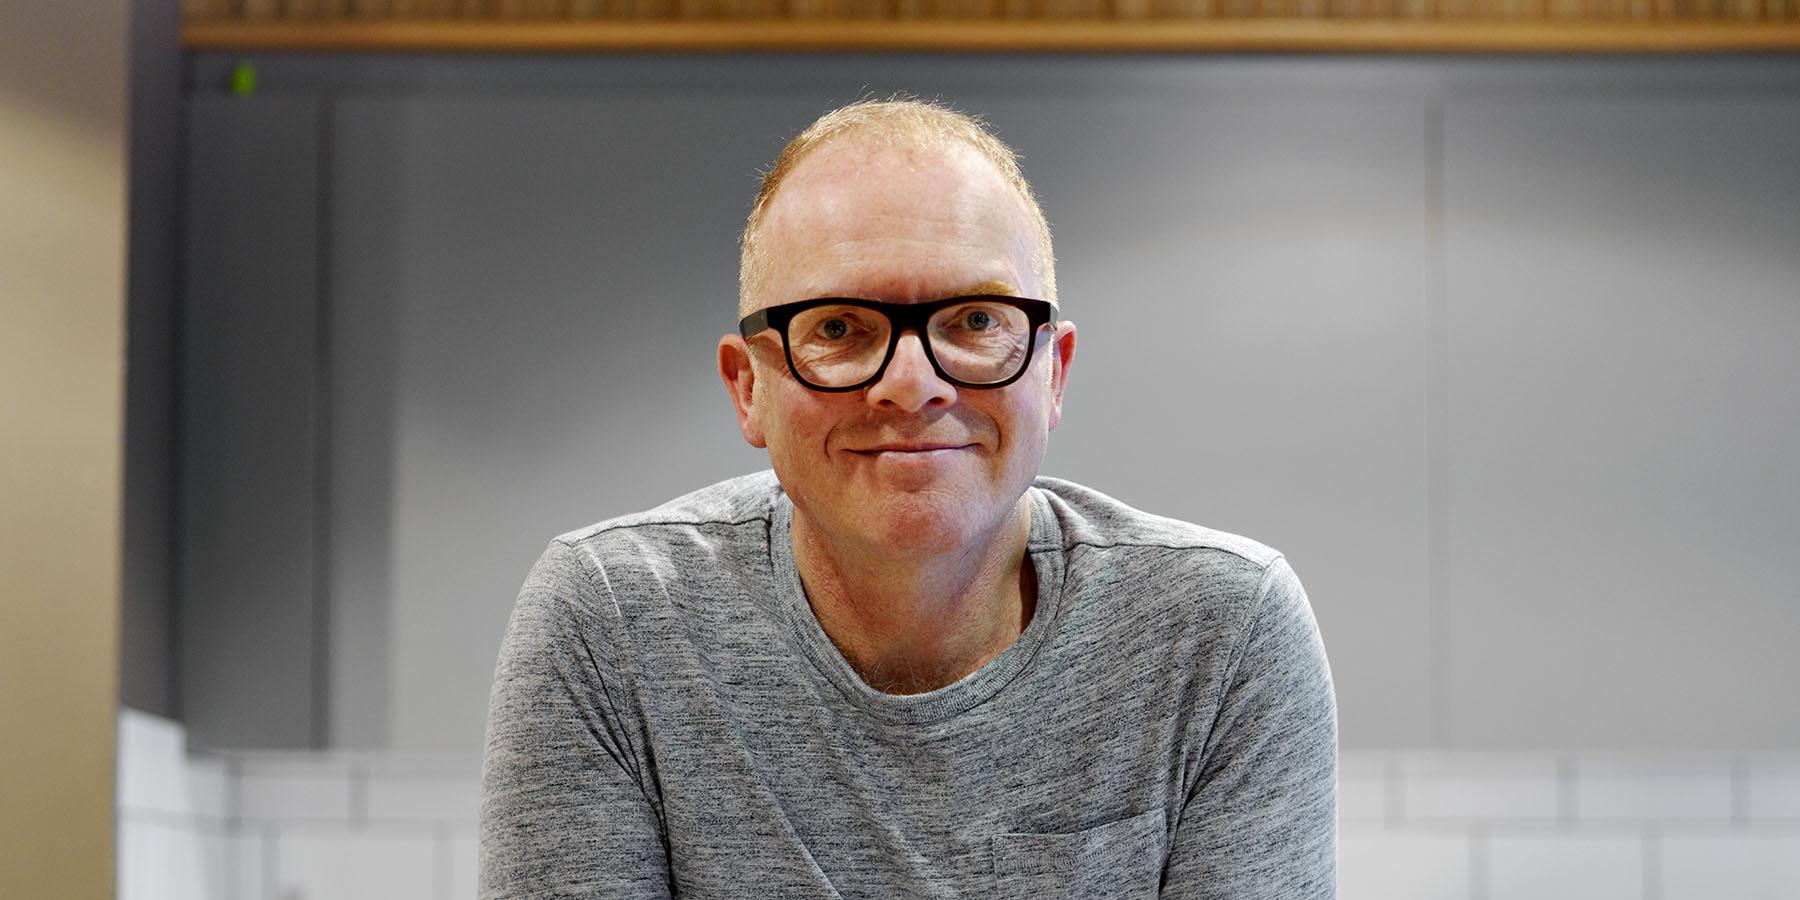 Leeds based Freelance Designer Neil Holroyd